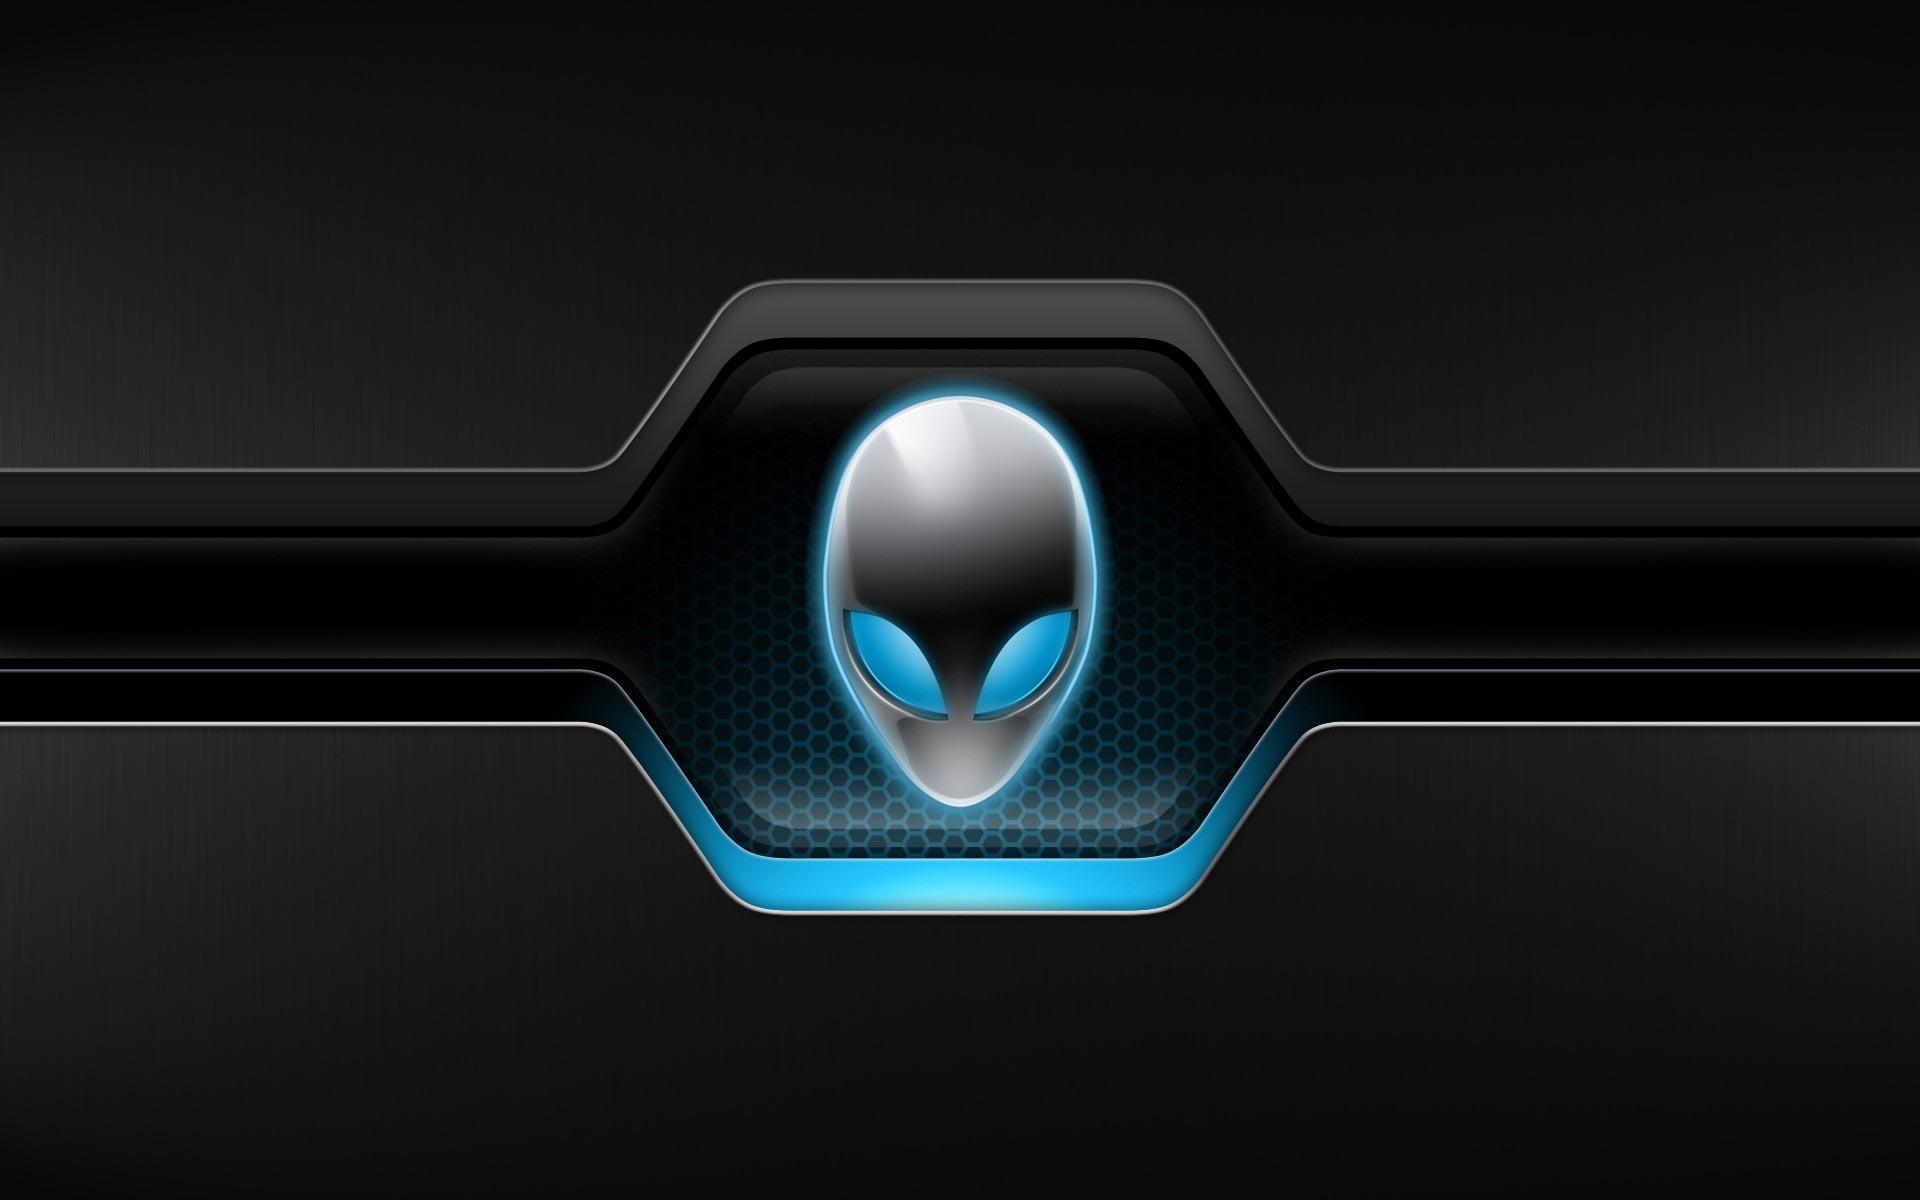 Alienware Wallpaper 1920X1080 HD